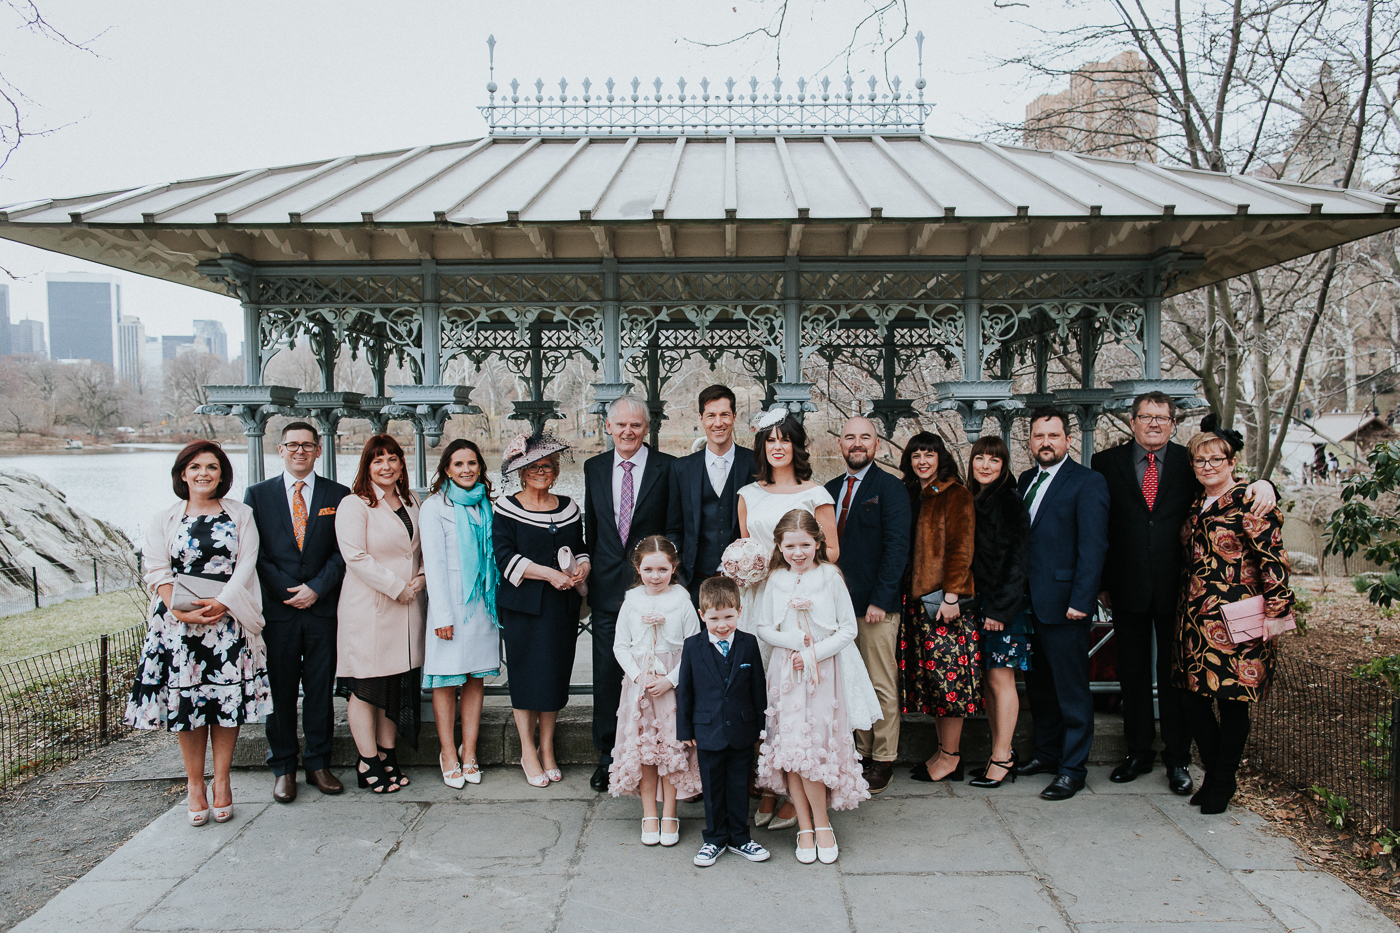 Ladies-Pavilion-Central-Park-NYC-Documentary-Elopement-Wedding-Photographer-38.jpg